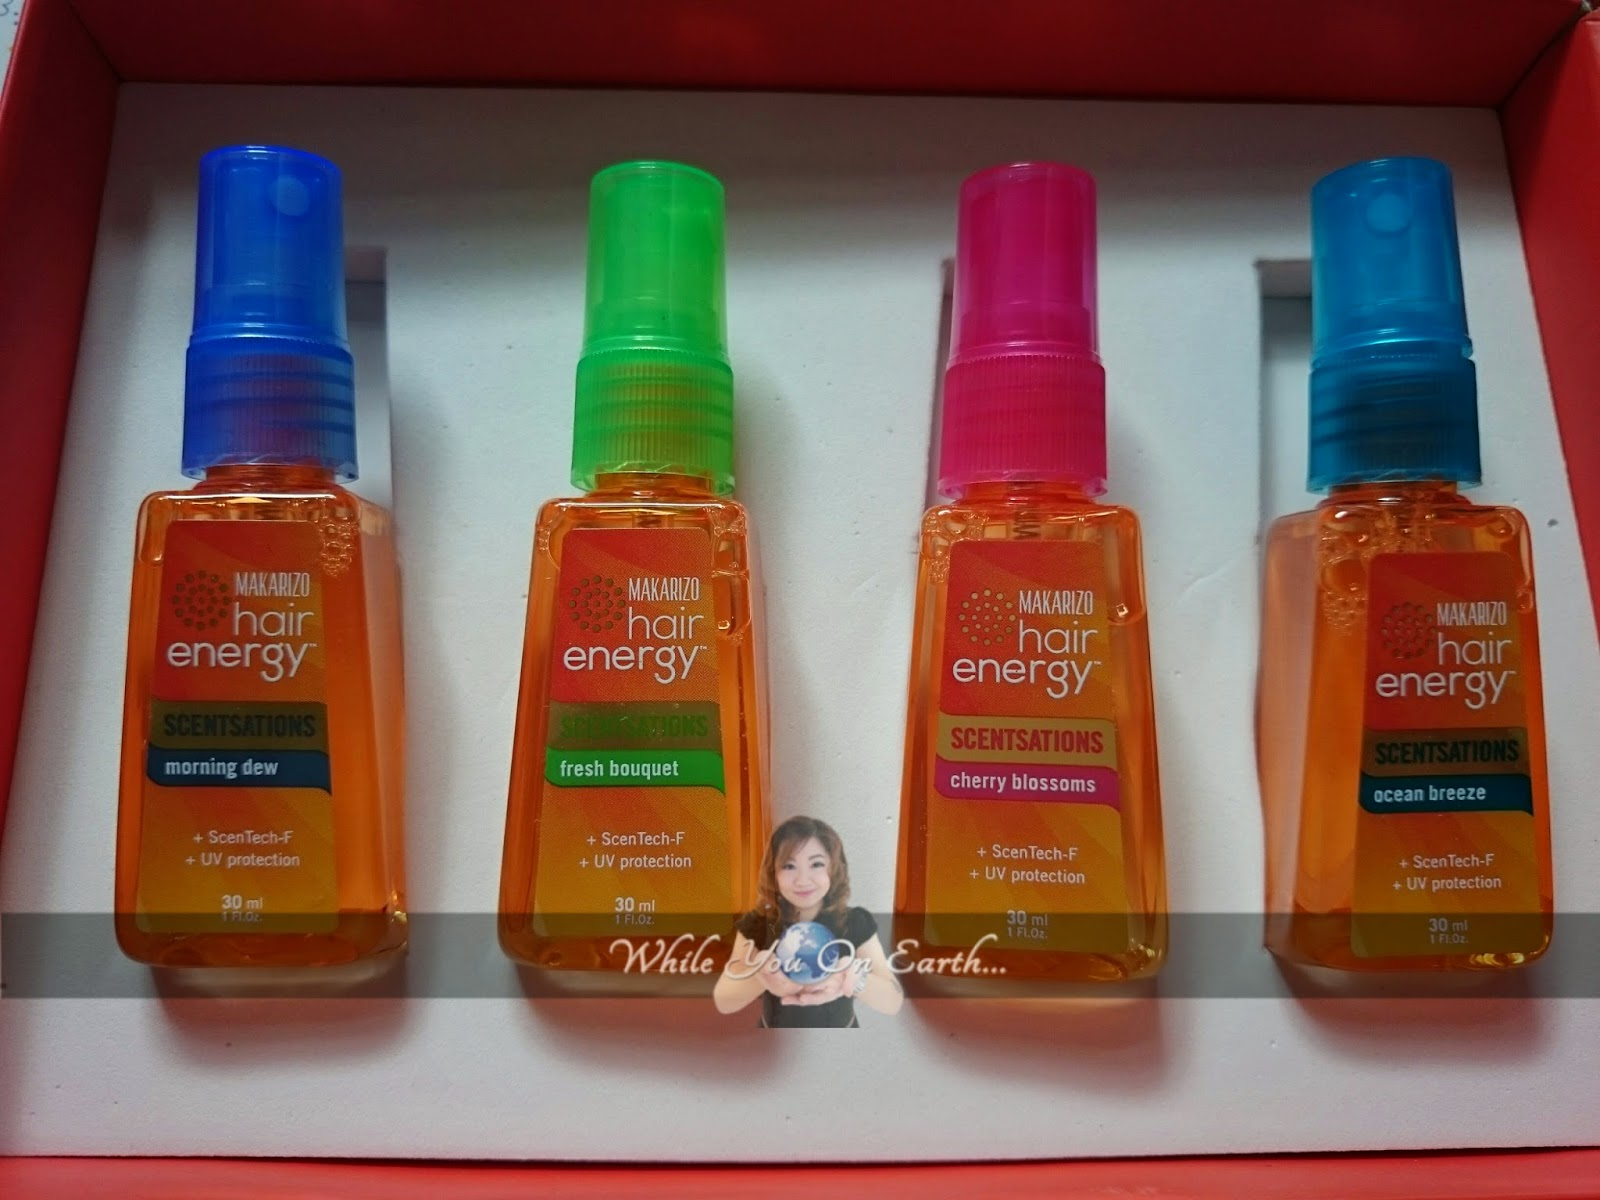 Harga Makarizo Hair Energy Royal Jelly 500gr Terbaru 2018 Shampo Sachet Melon Lemon Mask Review